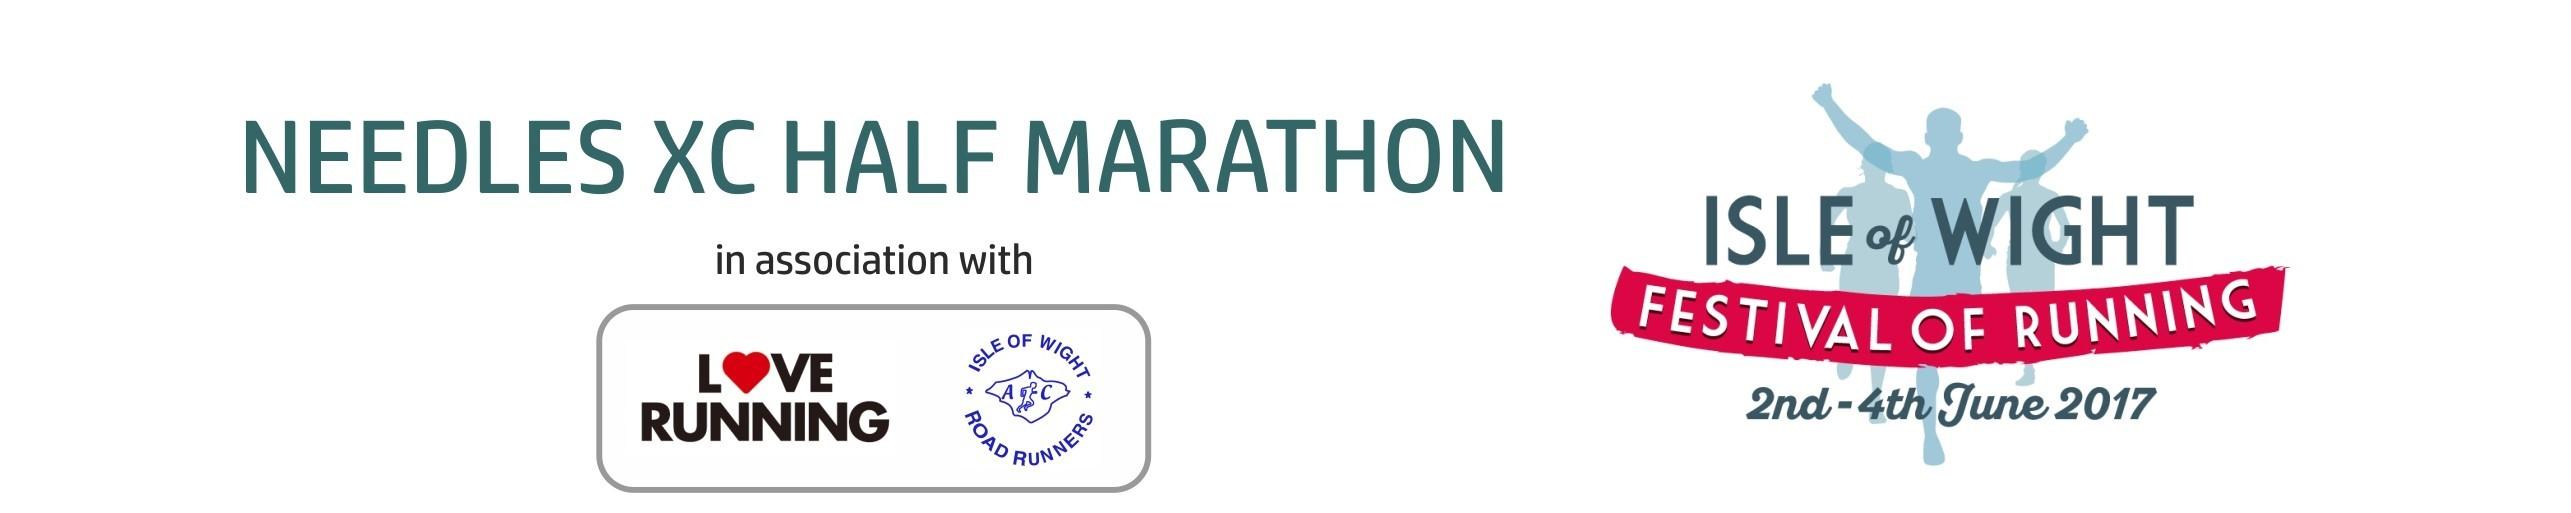 Isle of Wight Festival of Running \u002D Needles Half Marathon - cover image